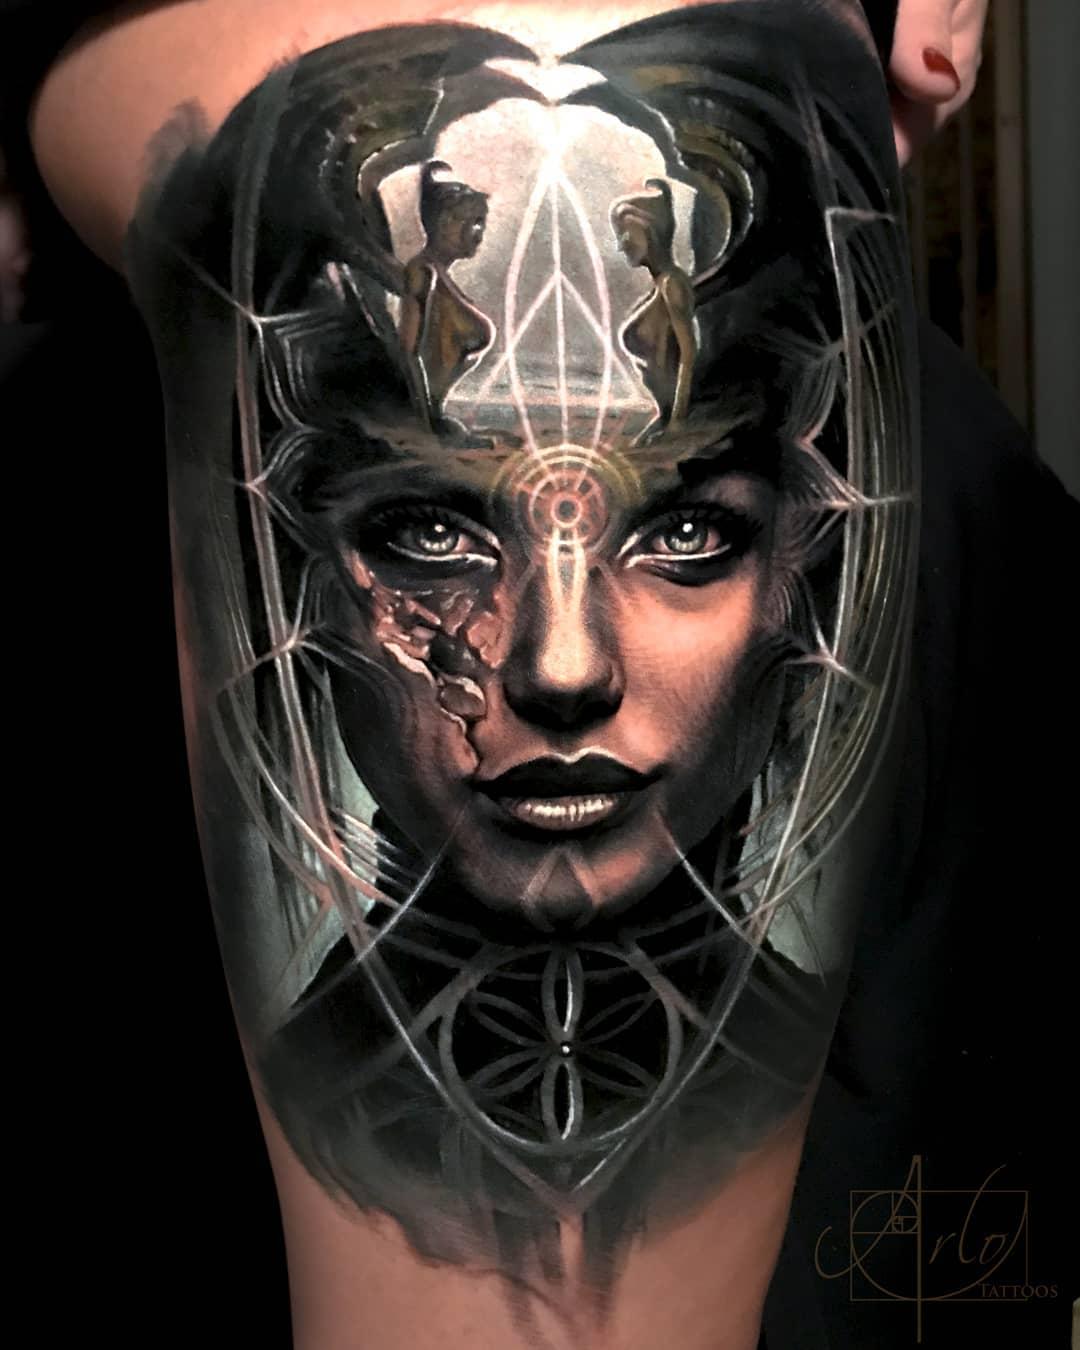 Arlo-DiCristina-Tattoos